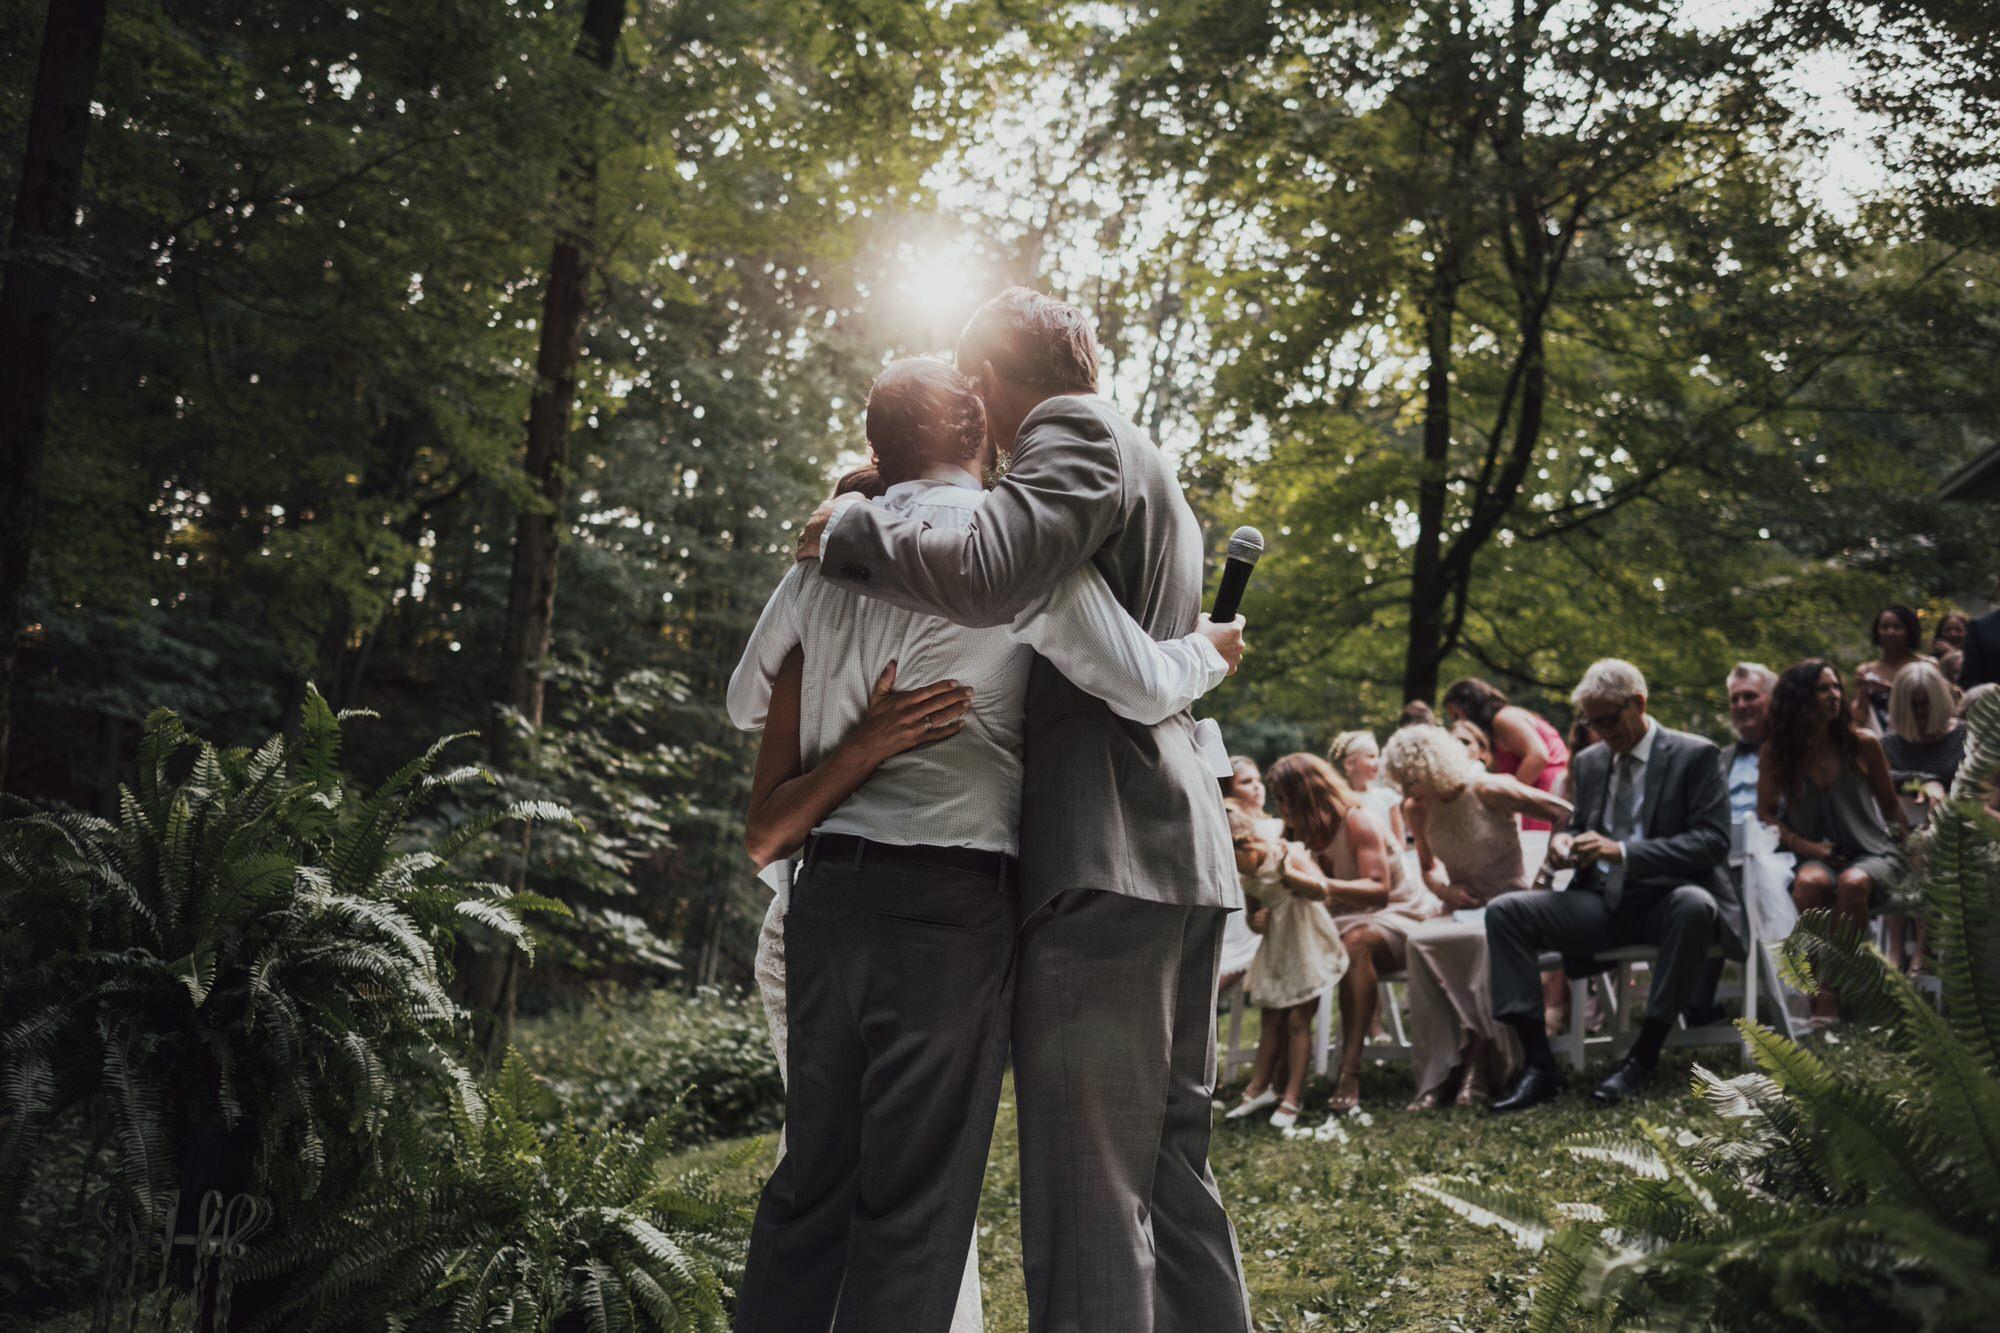 emily-aaron-rochester-new-york-wedding-photographer-156.JPG